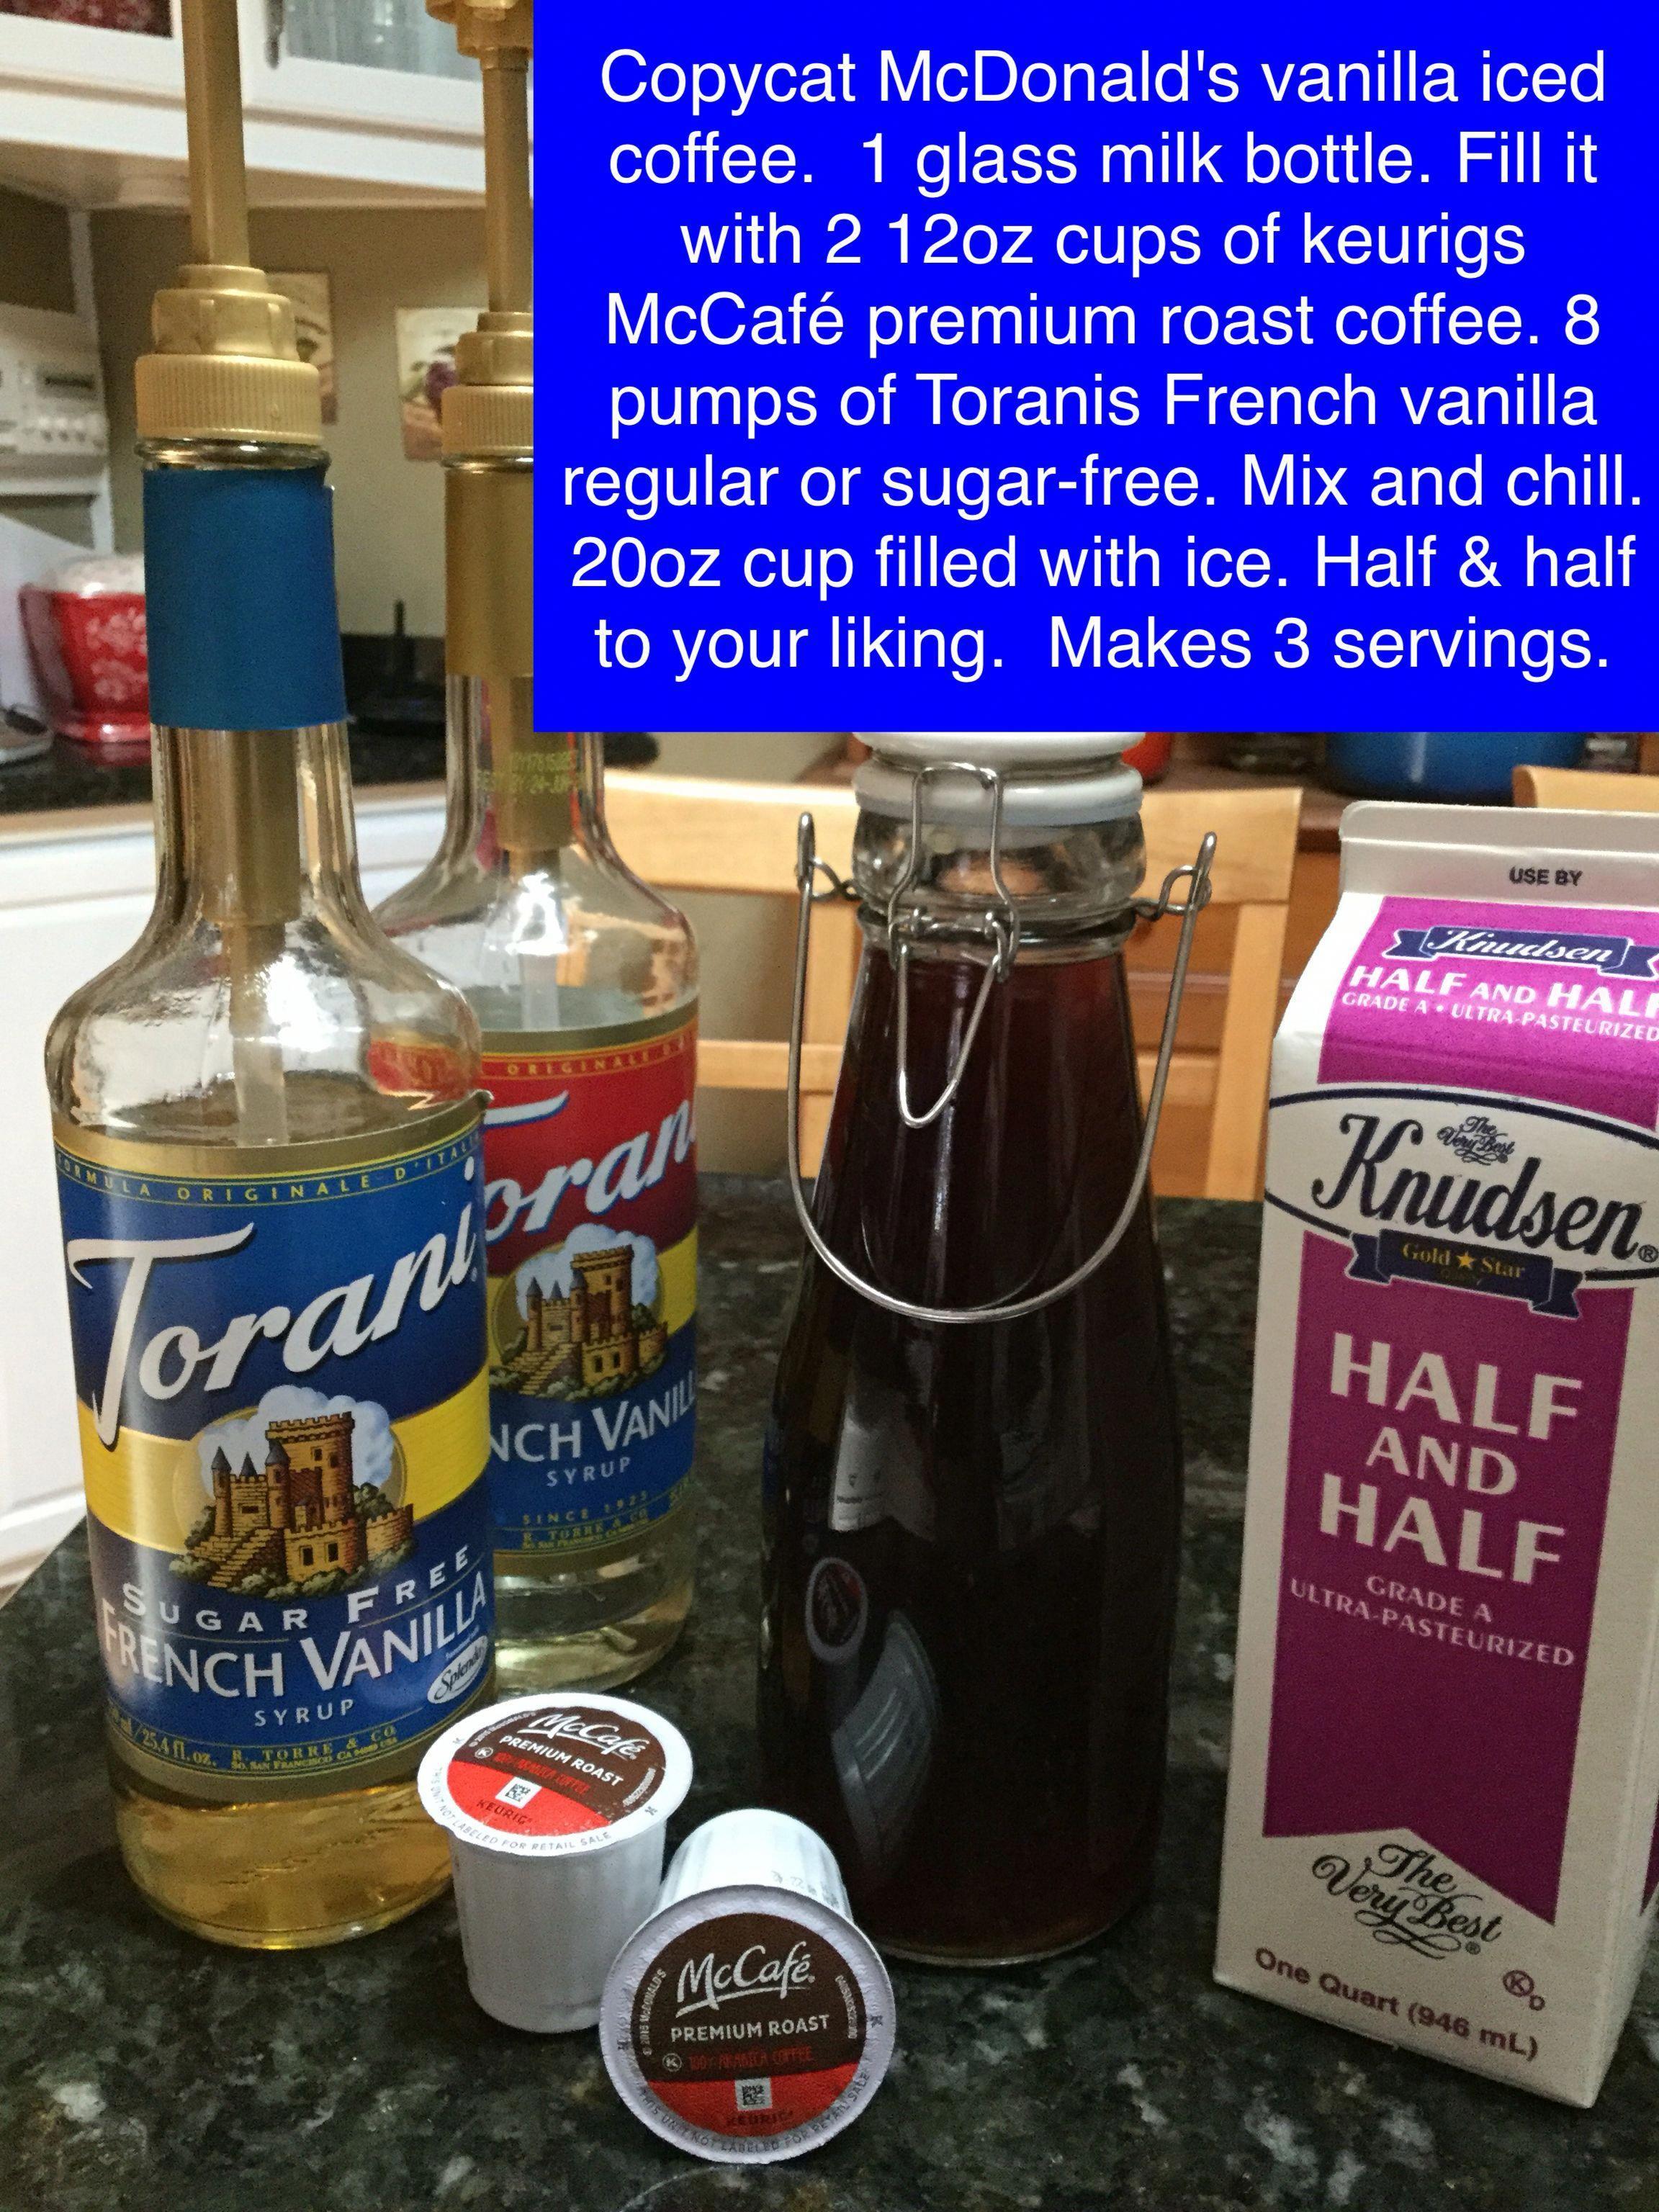 Copycat McDonald's vanilla iced coffee. 1 glass milk